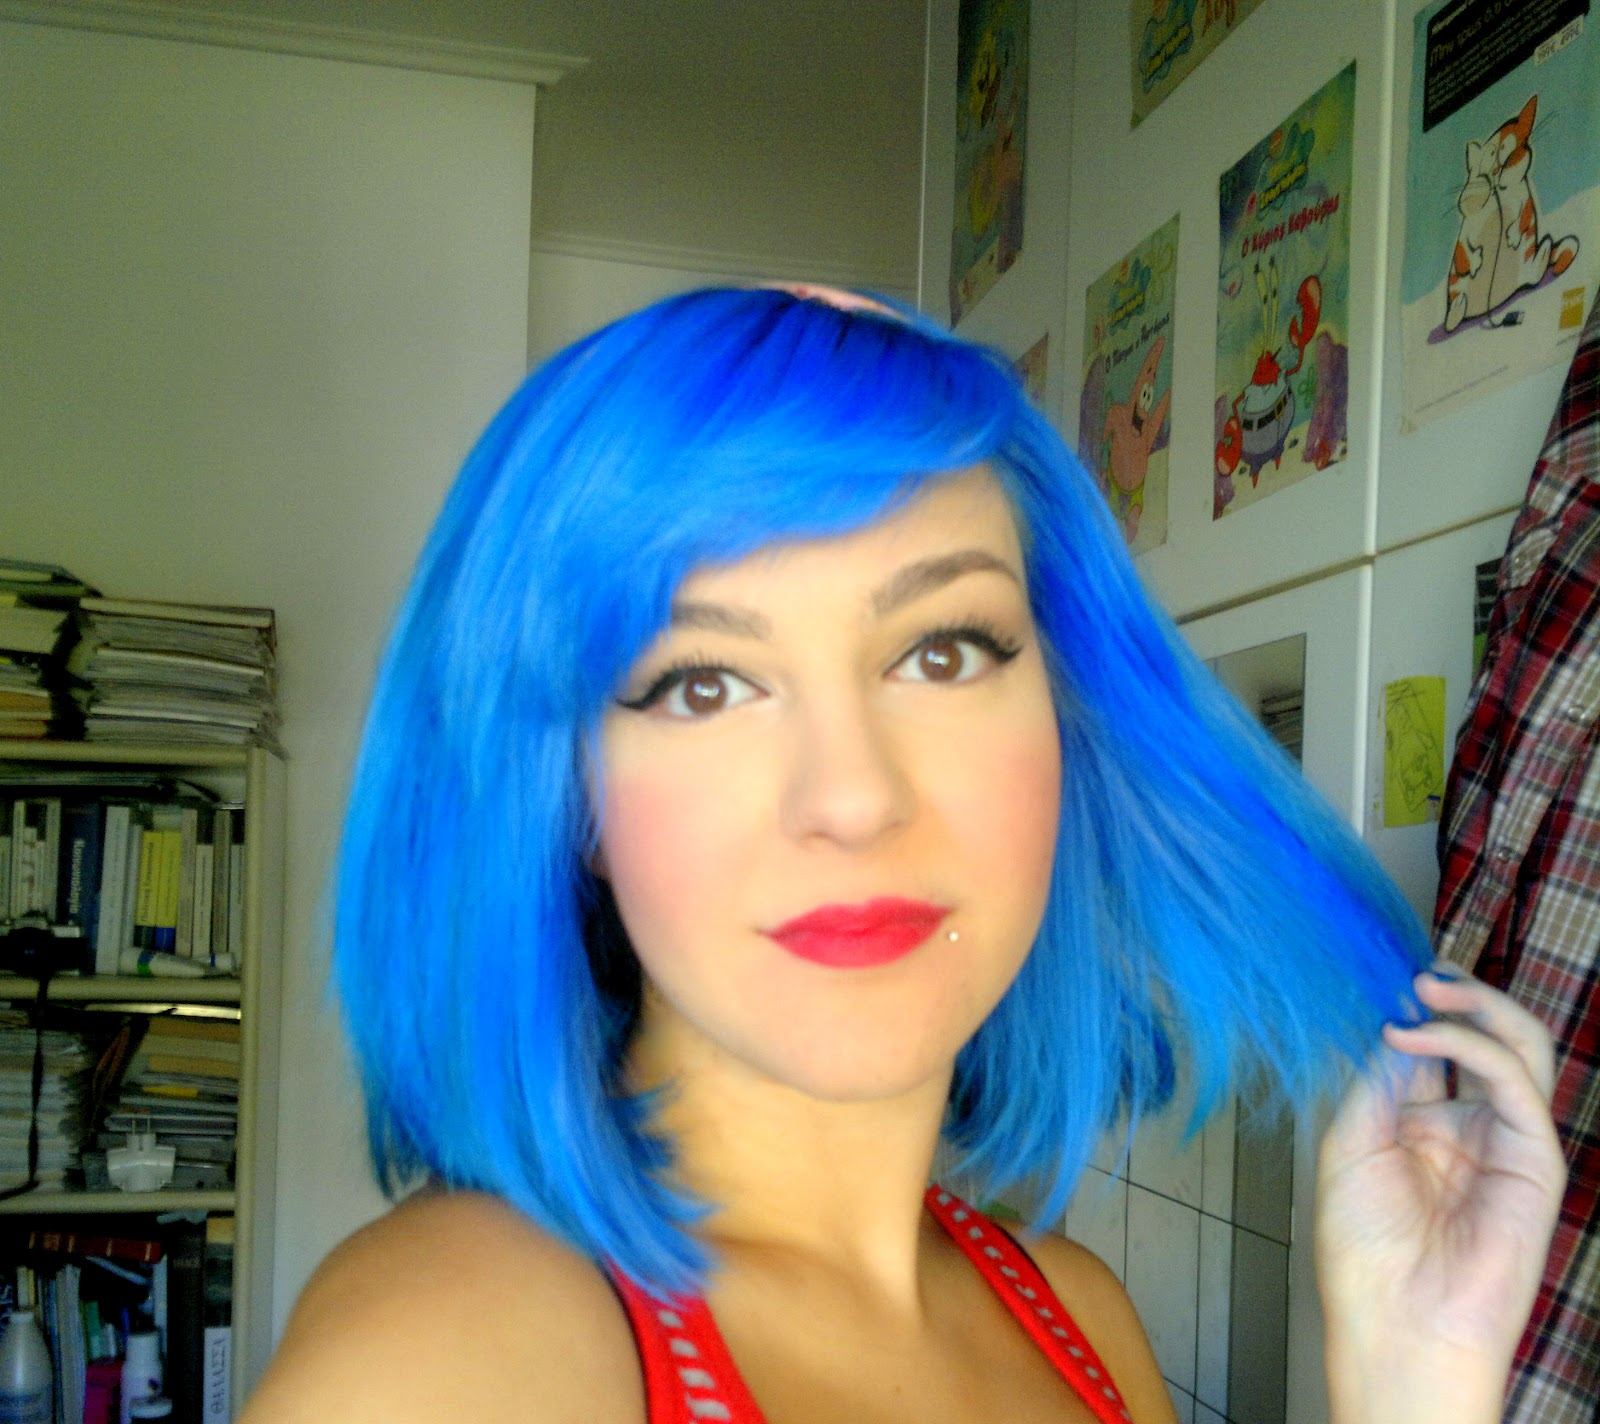 Lagoon Blue Hair Bubble My Licorice - Hair colour in blue